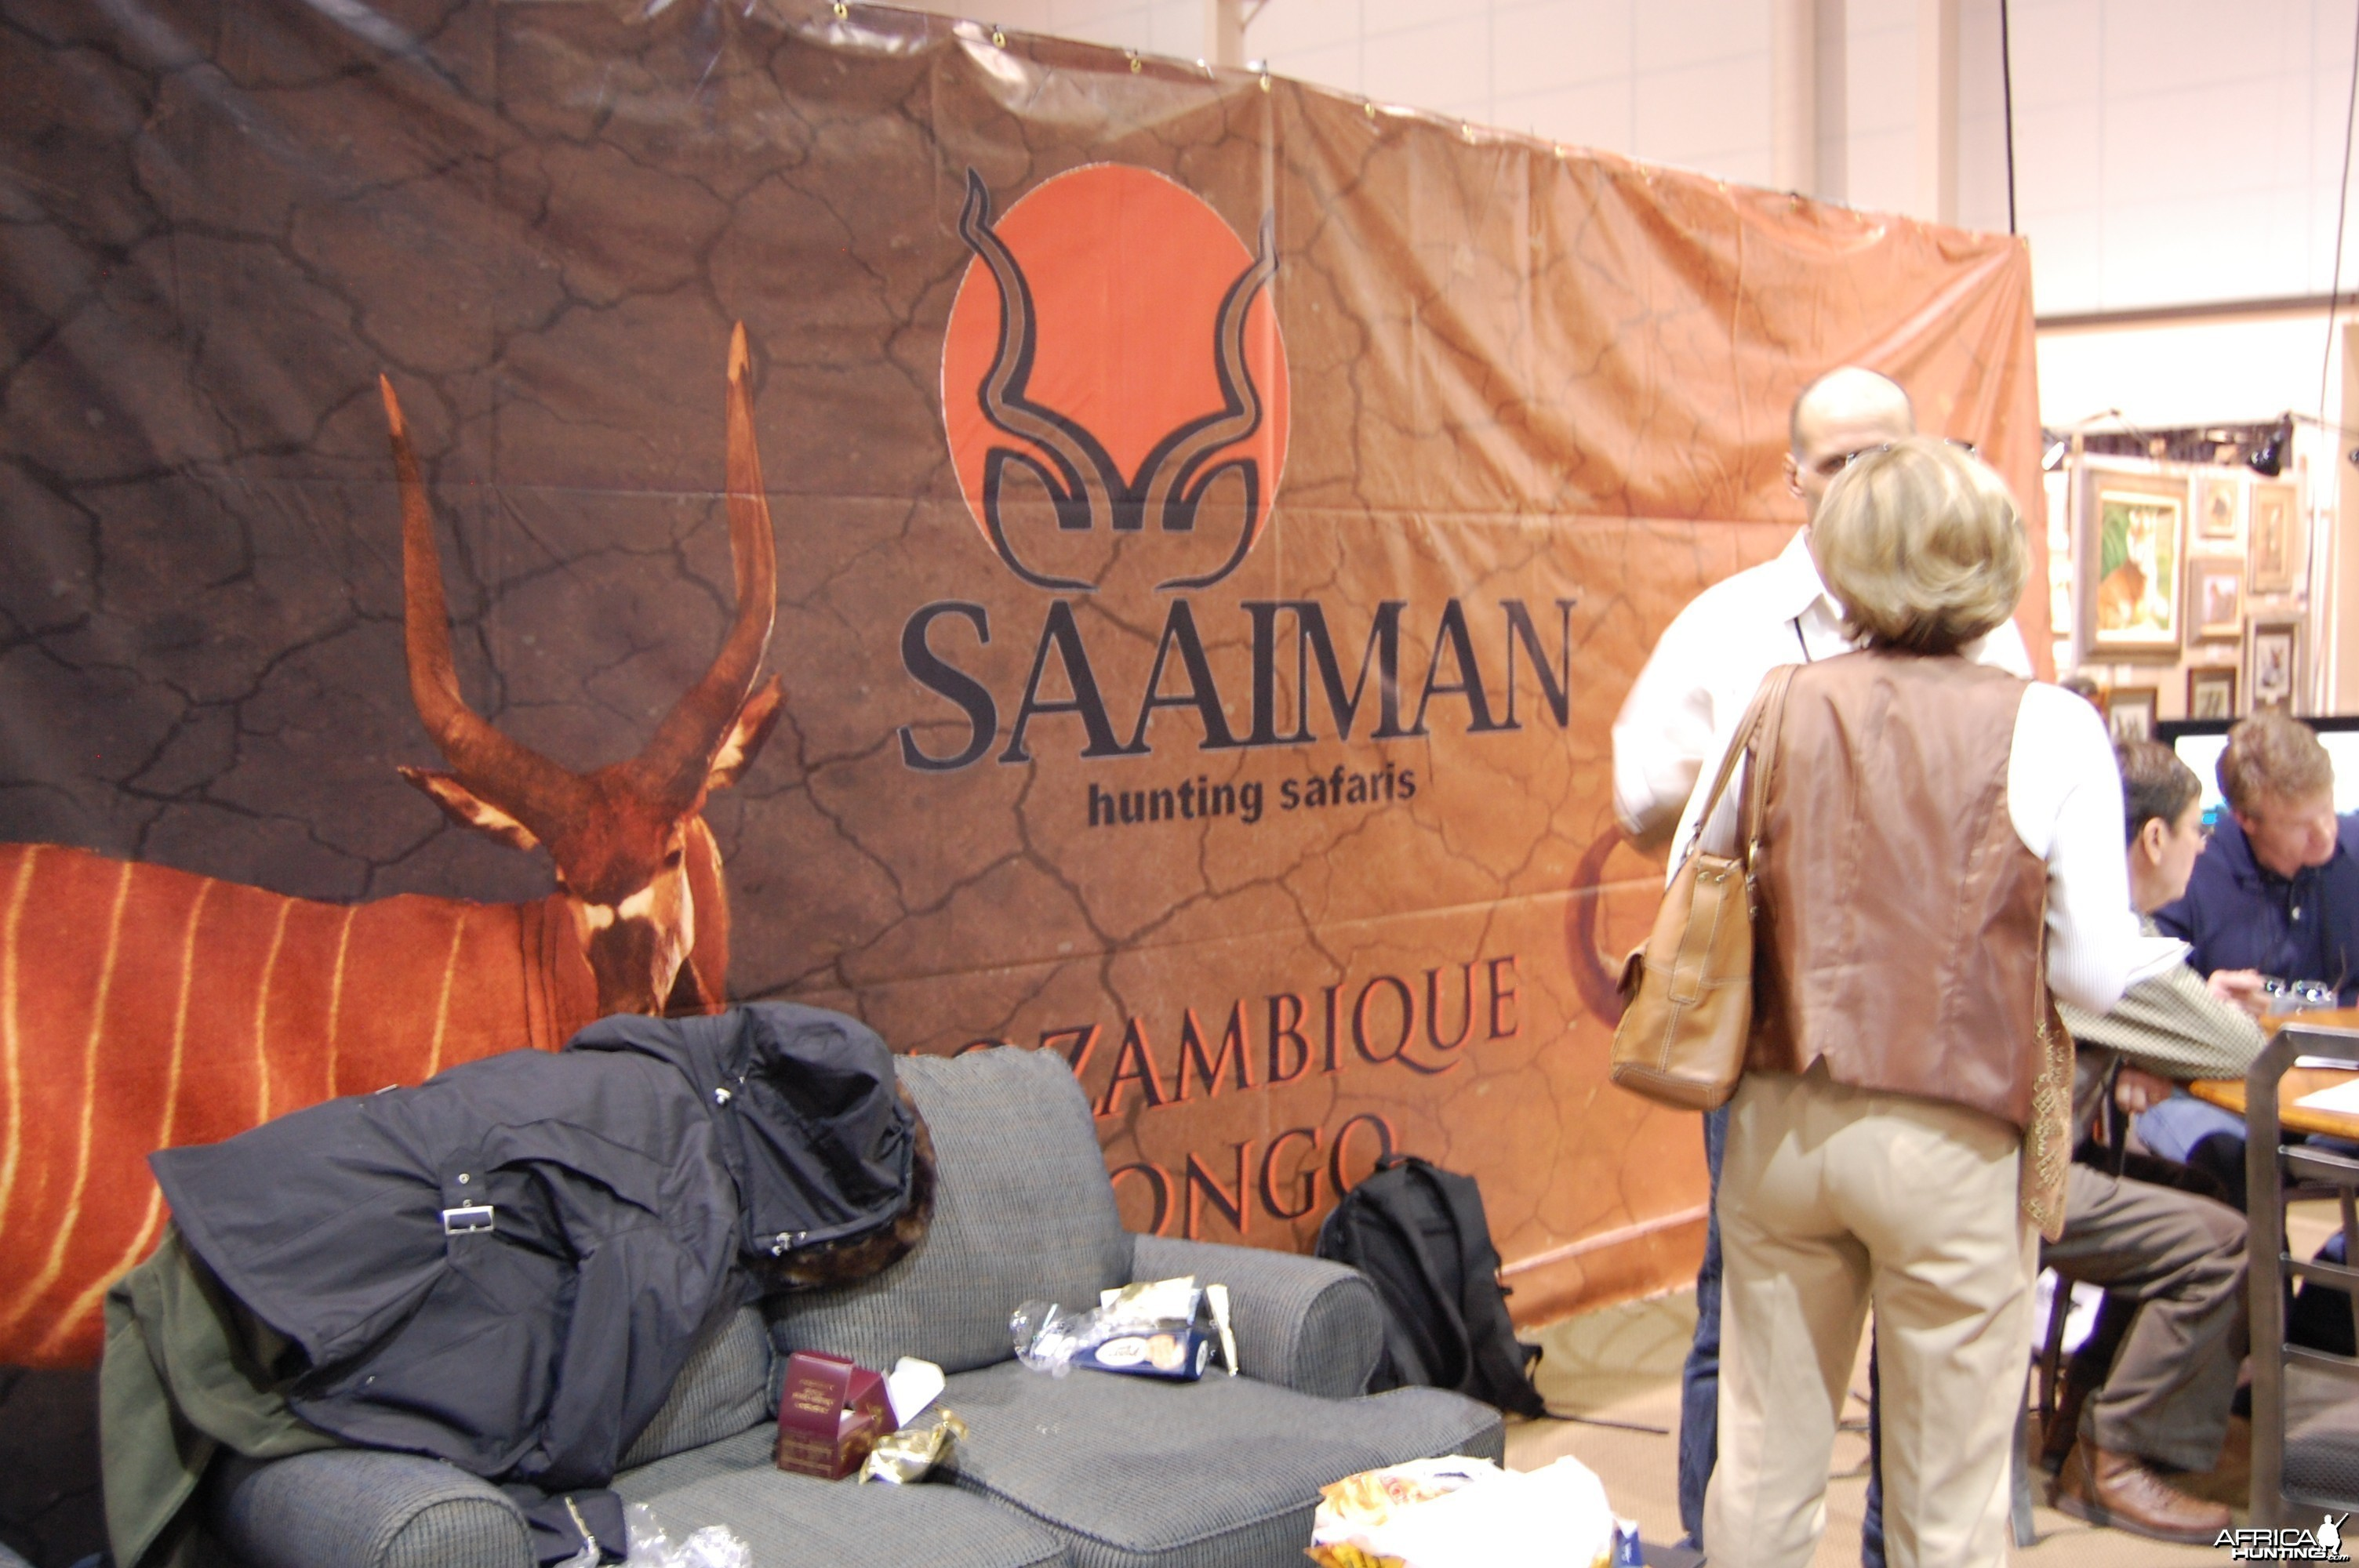 Saaiman Hunting Safaris